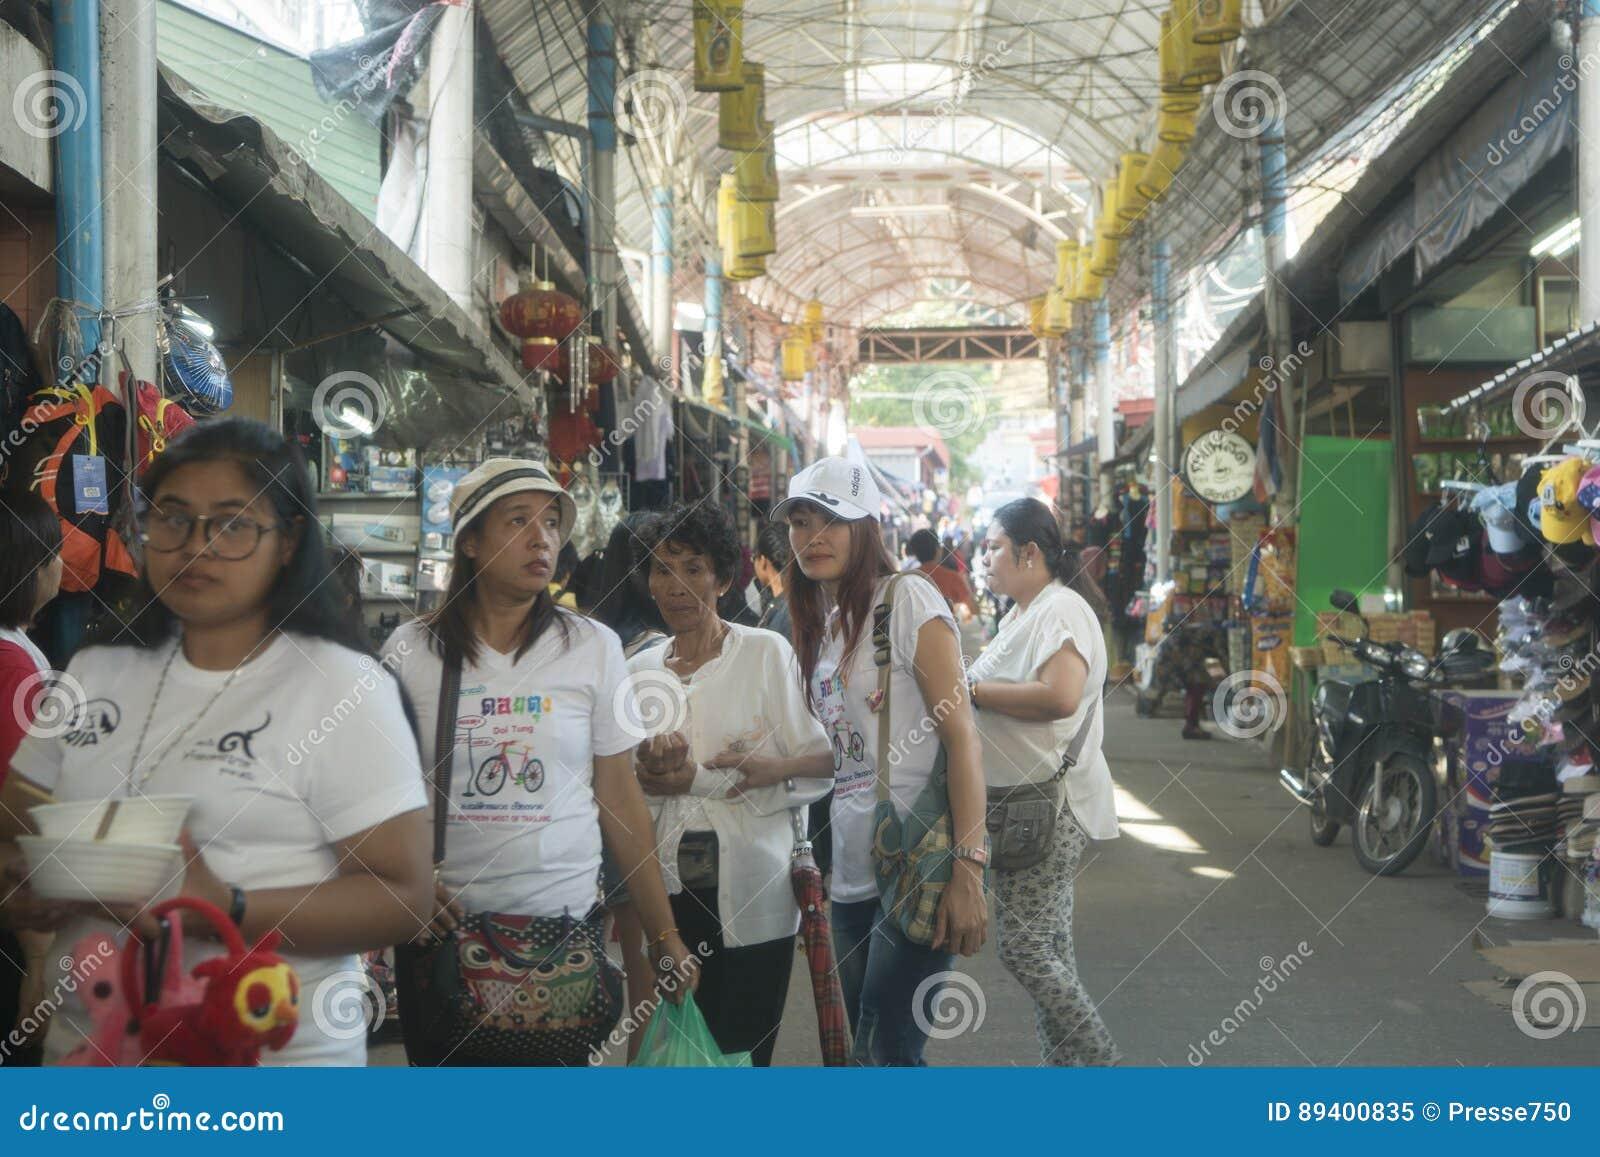 TAILÂNDIA CHIANG RAI MAE SAI MARKETSTREET